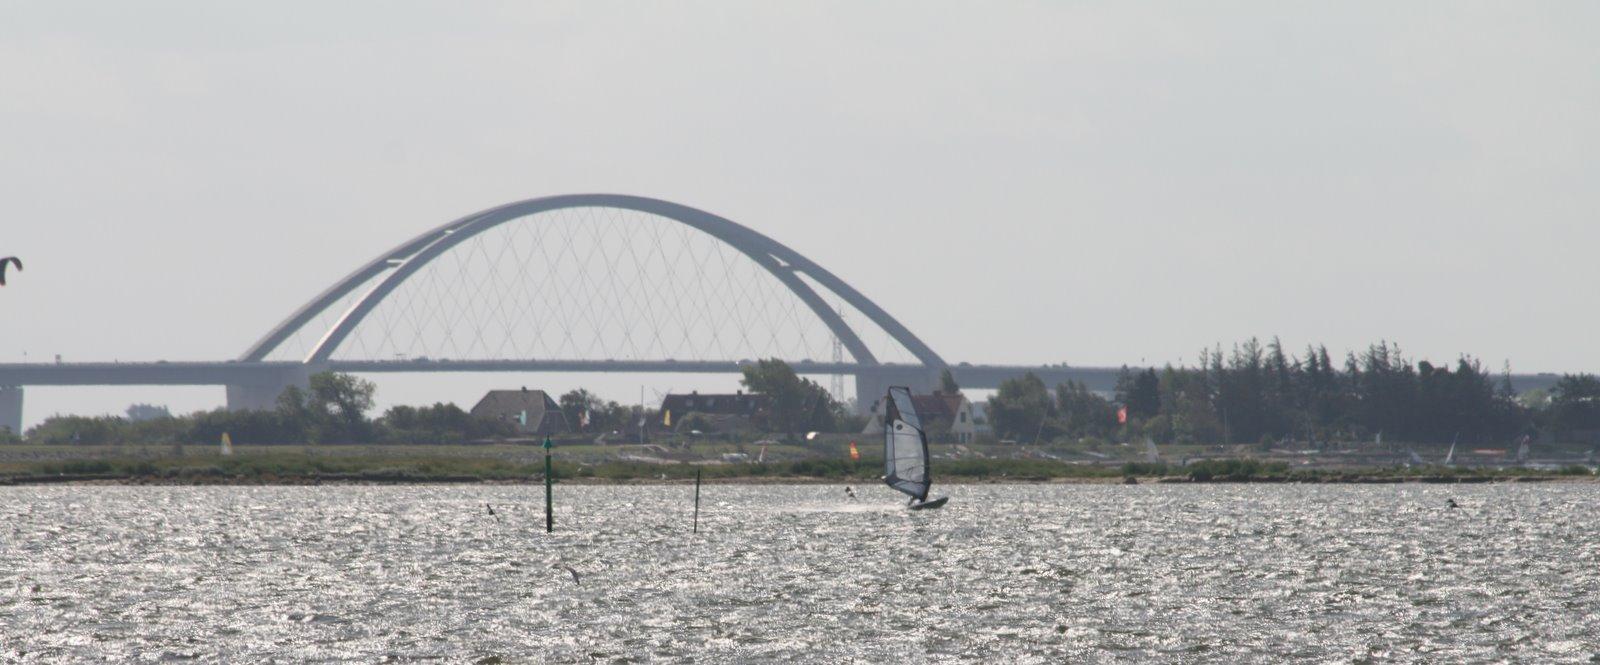 Windsurfen_Fehmarn_-_Lemkenhafen_IMG_2128.JPG